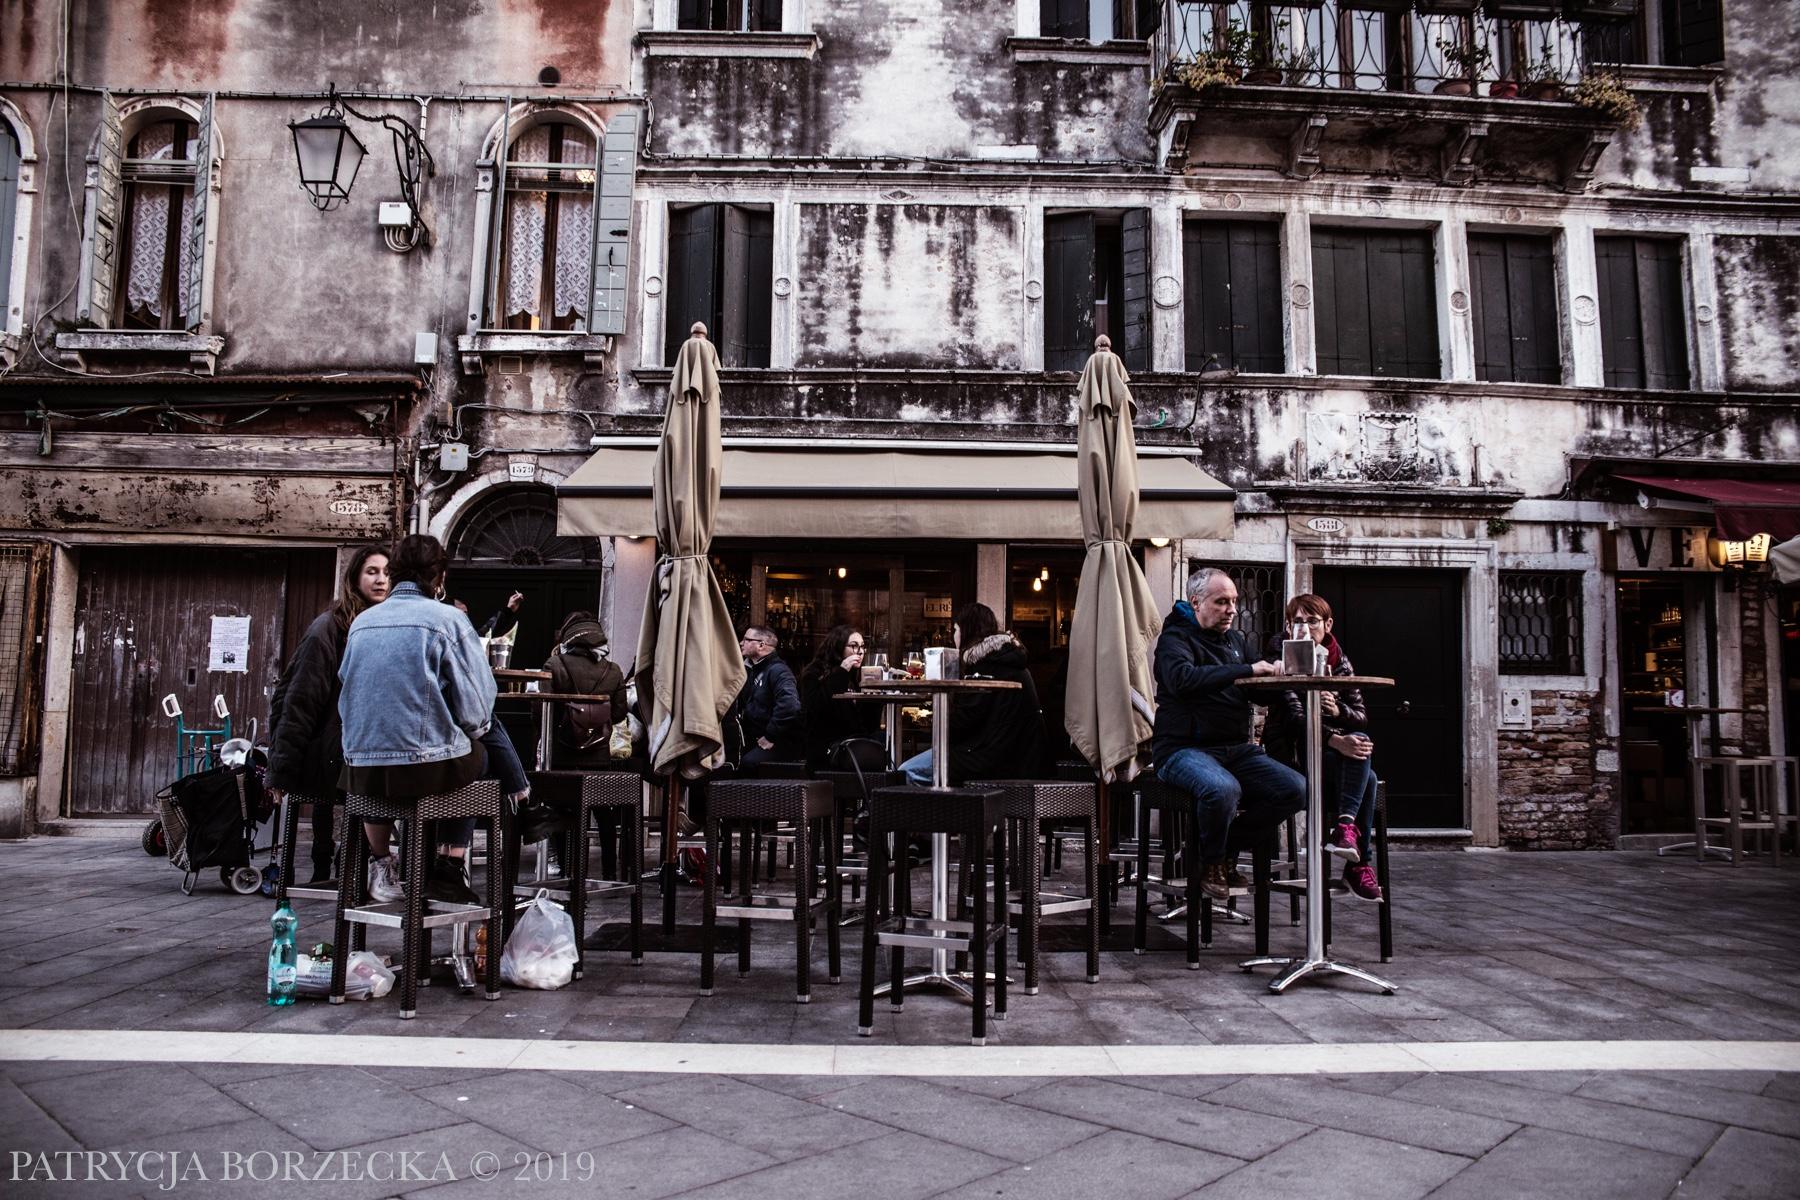 PatrycjaBorzecka-Photo-Venice-08